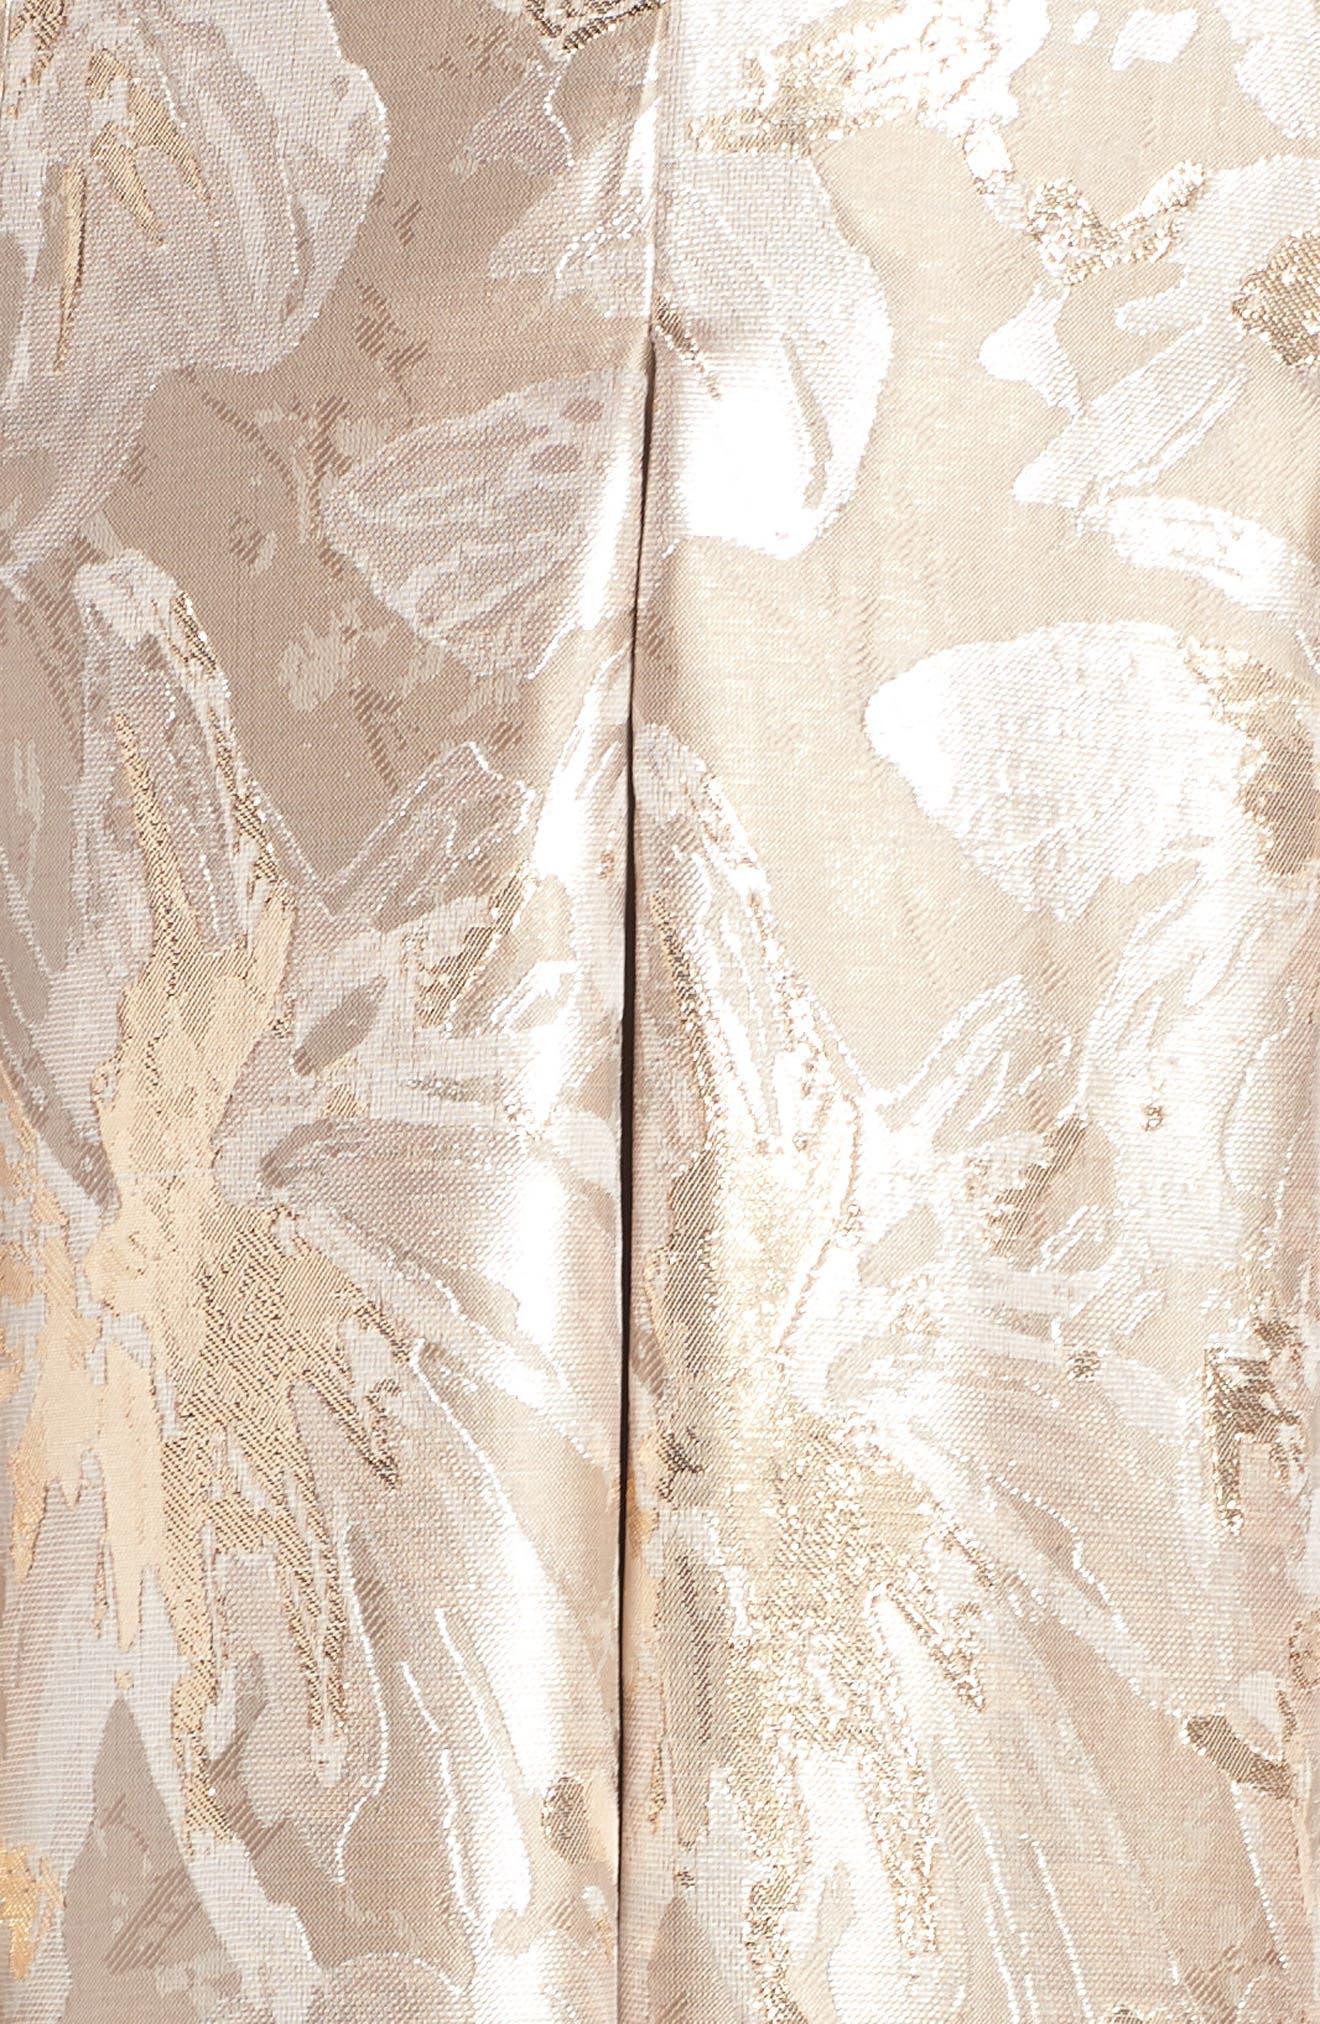 Bejeweled Neckline Strapless Ballgown,                             Alternate thumbnail 6, color,                             258